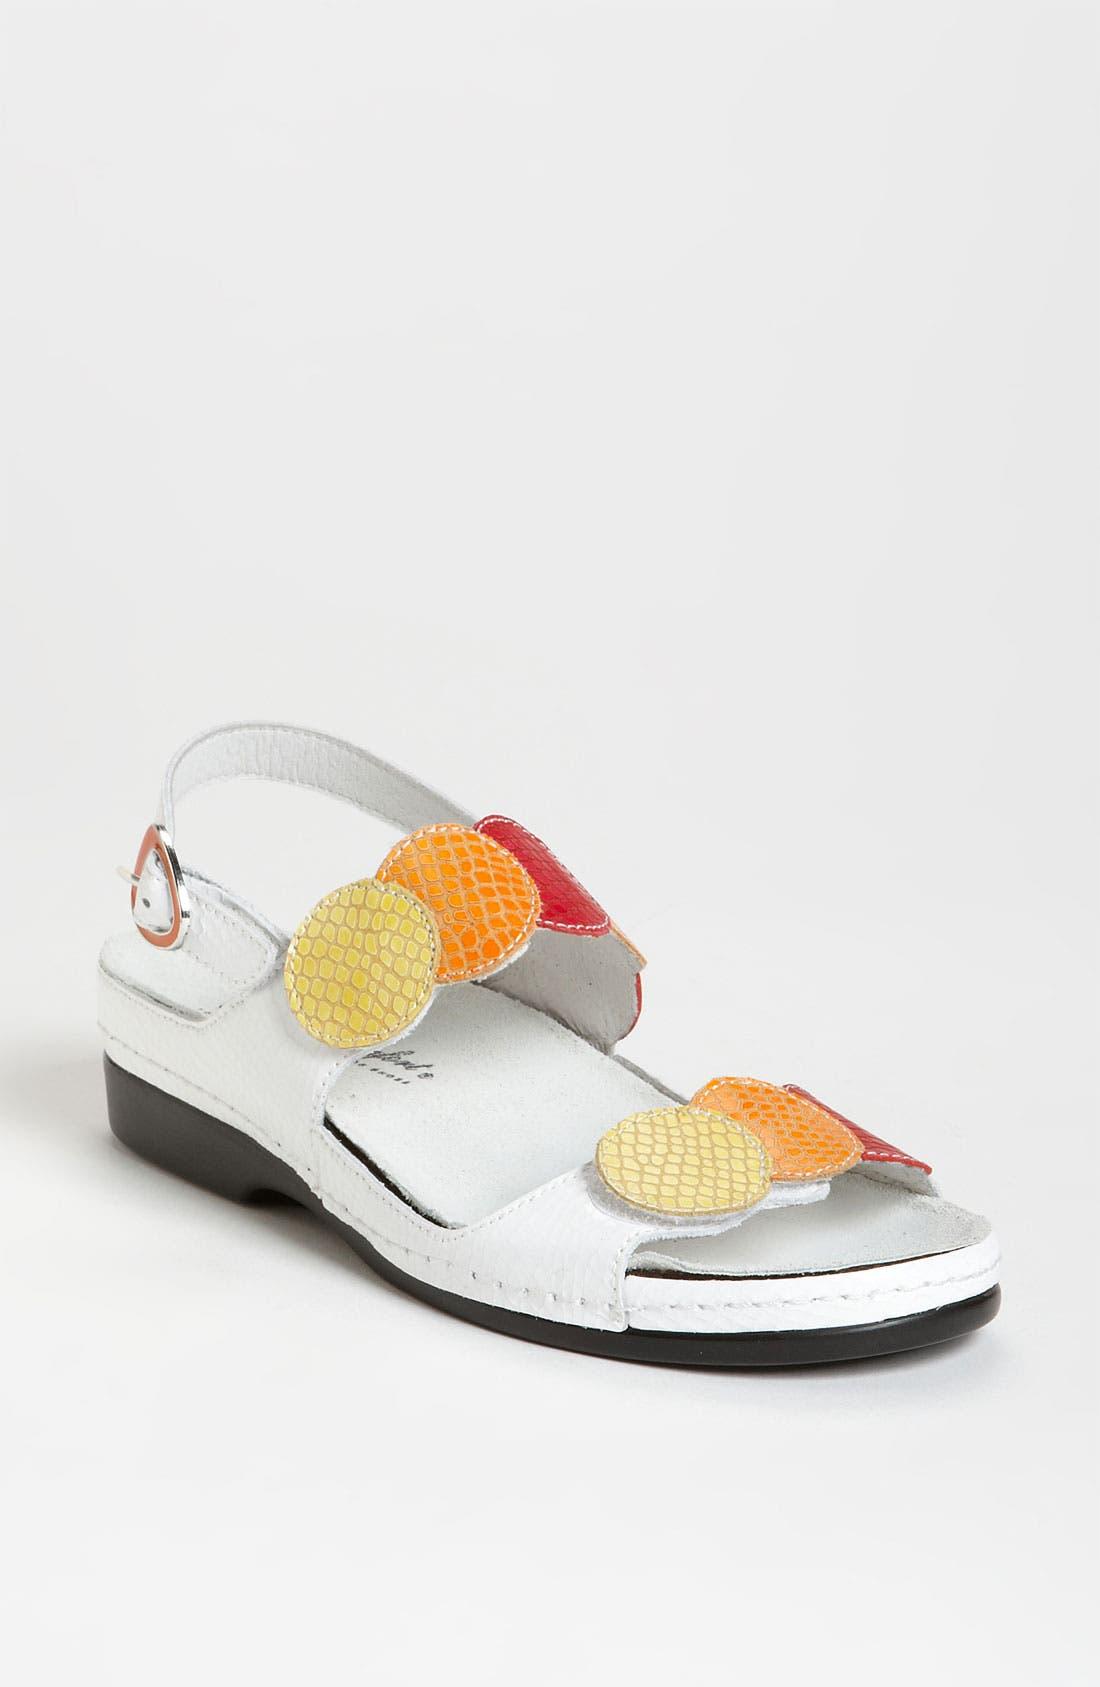 Alternate Image 1 Selected - Helle Comfort 'Tula' Sandal